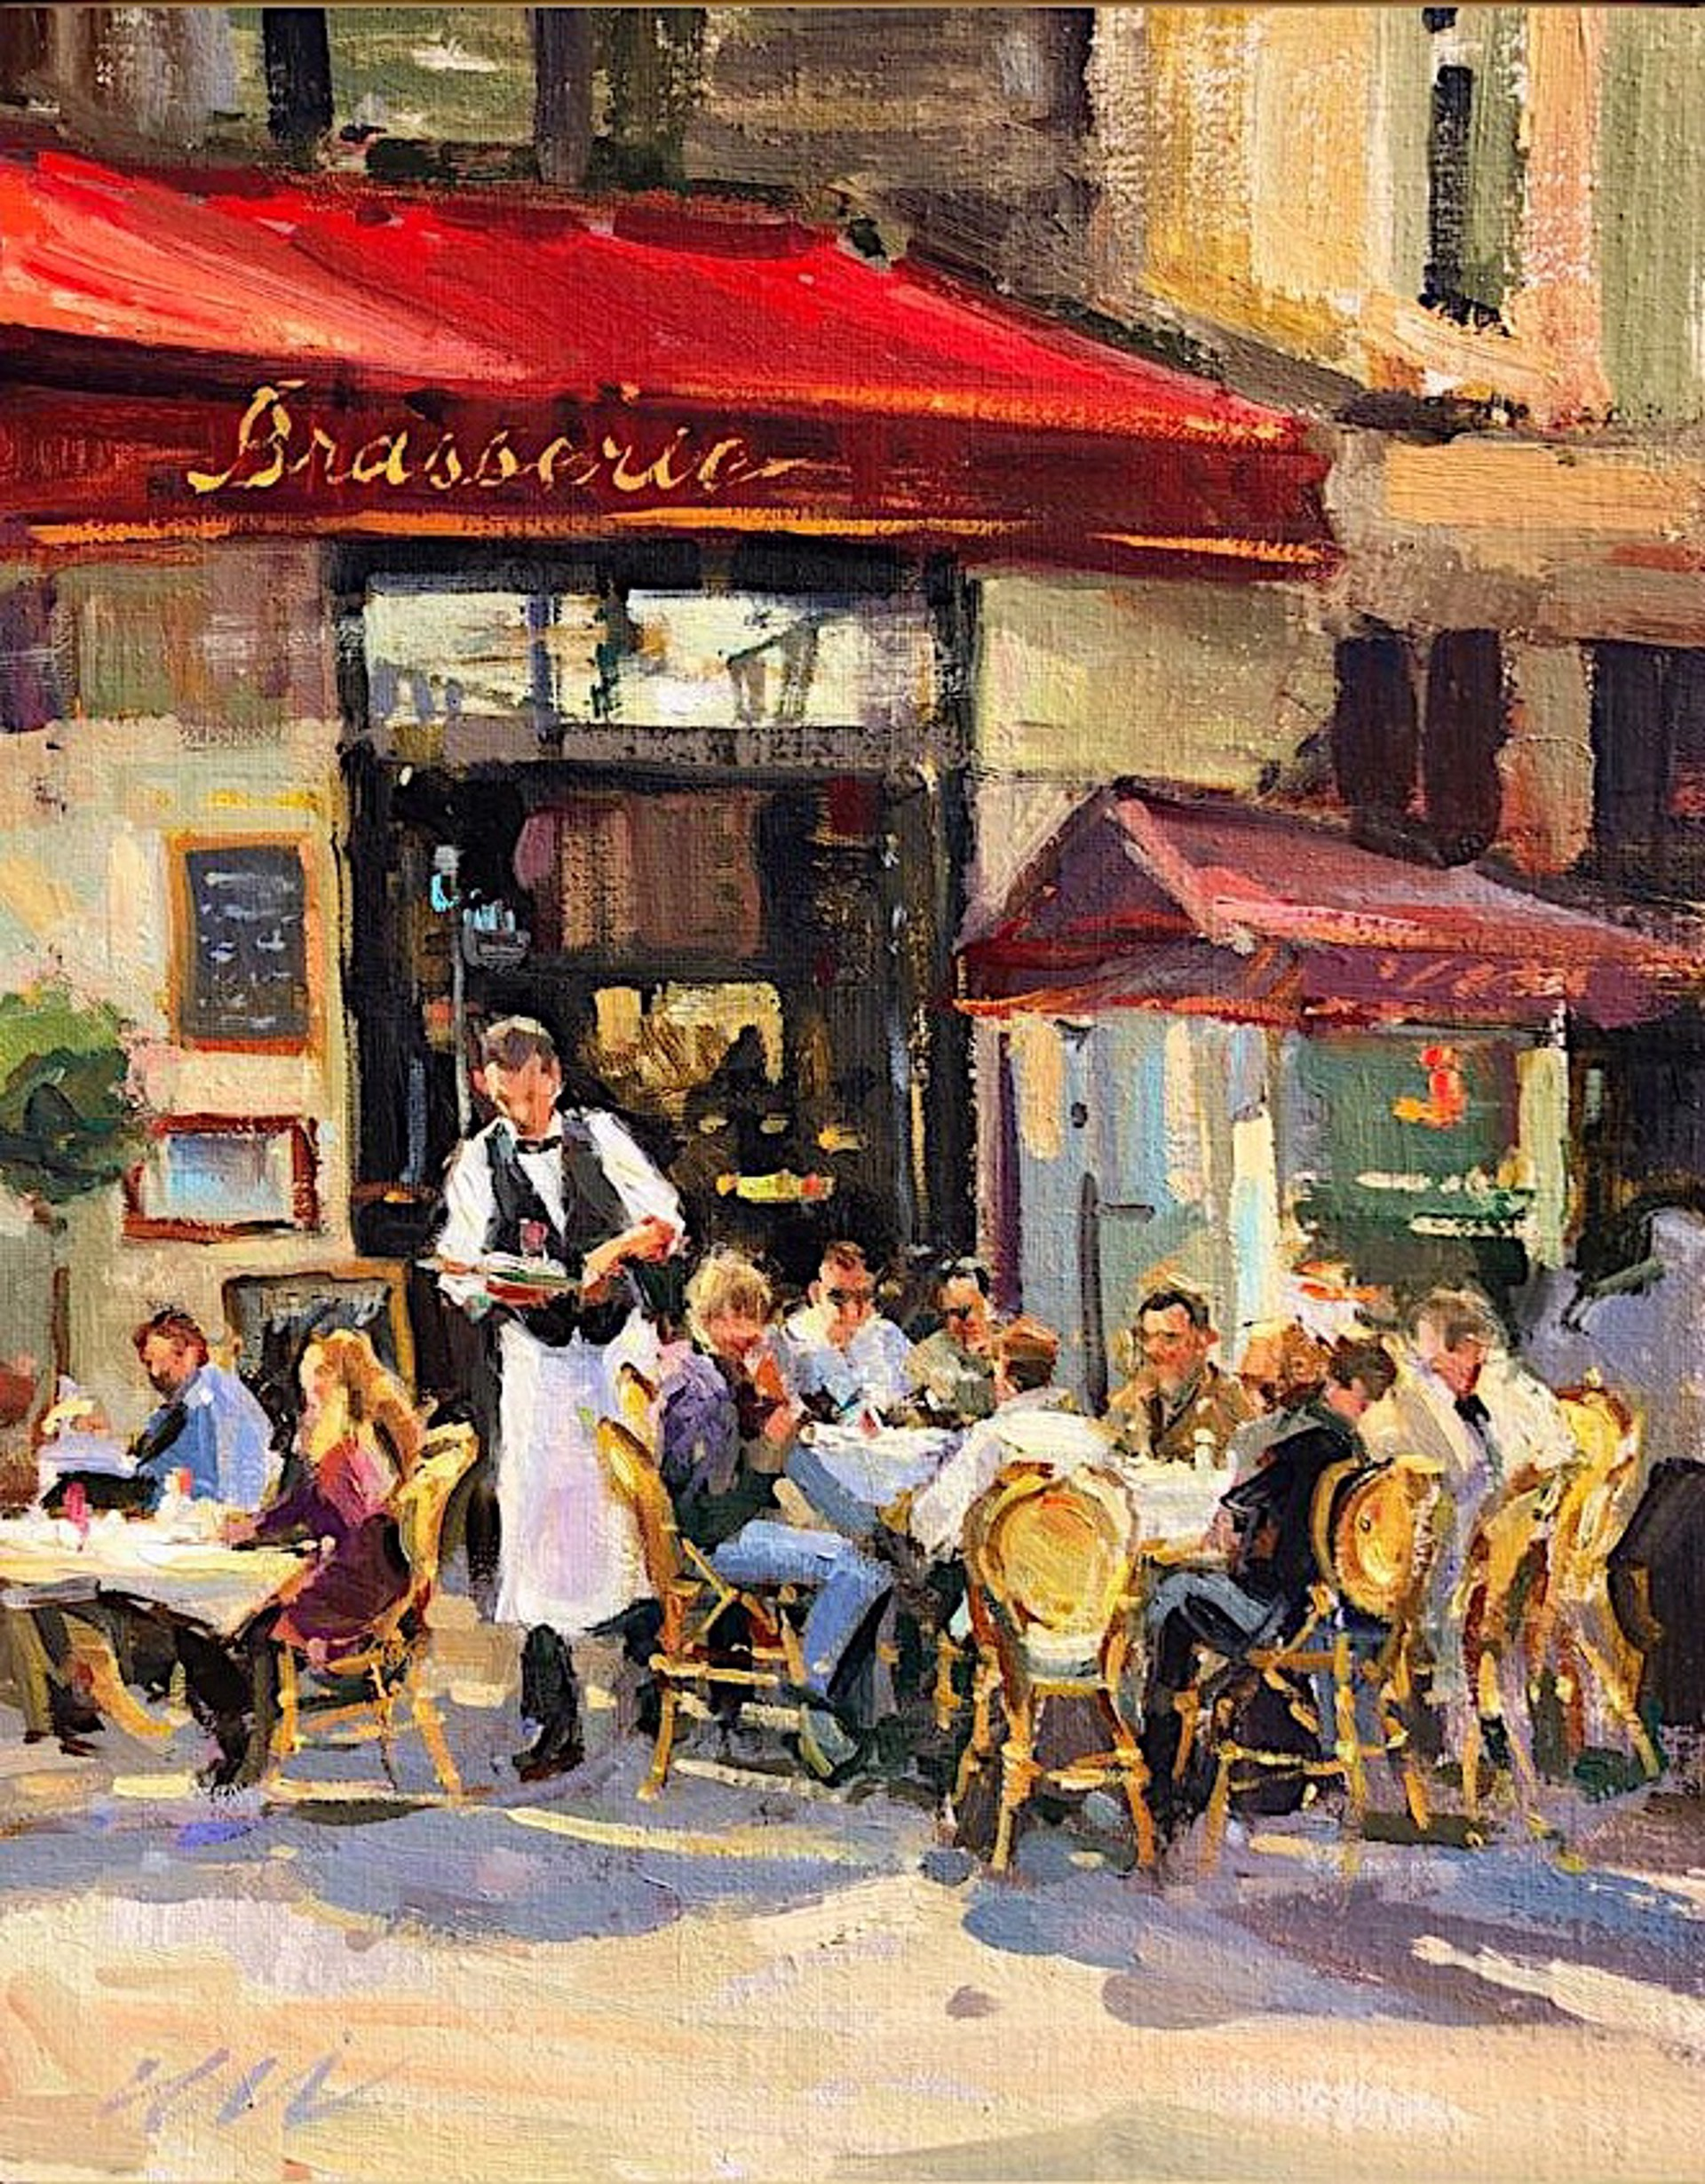 Brasserie by Eli Cedrone